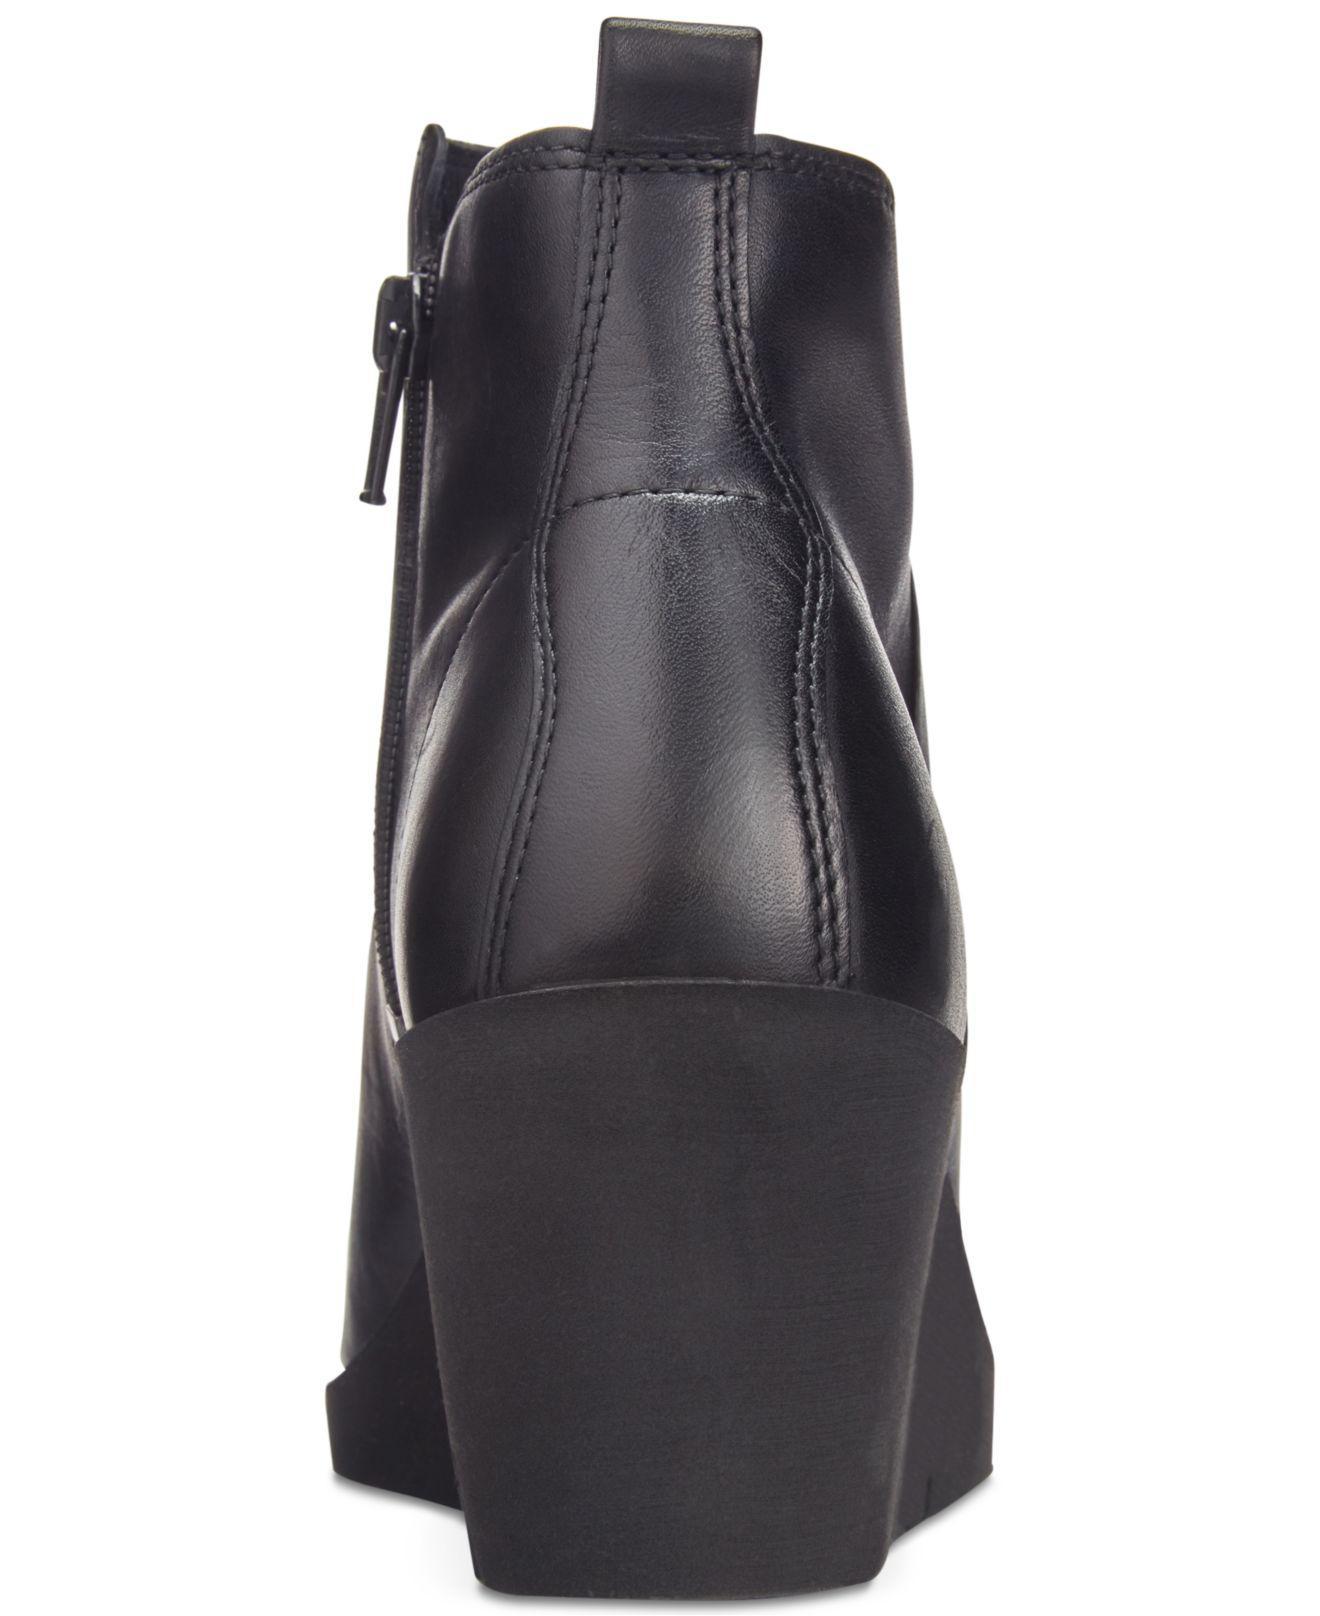 6aaa582ea1fe Lyst - Ecco Bella Wedge Booties in Black